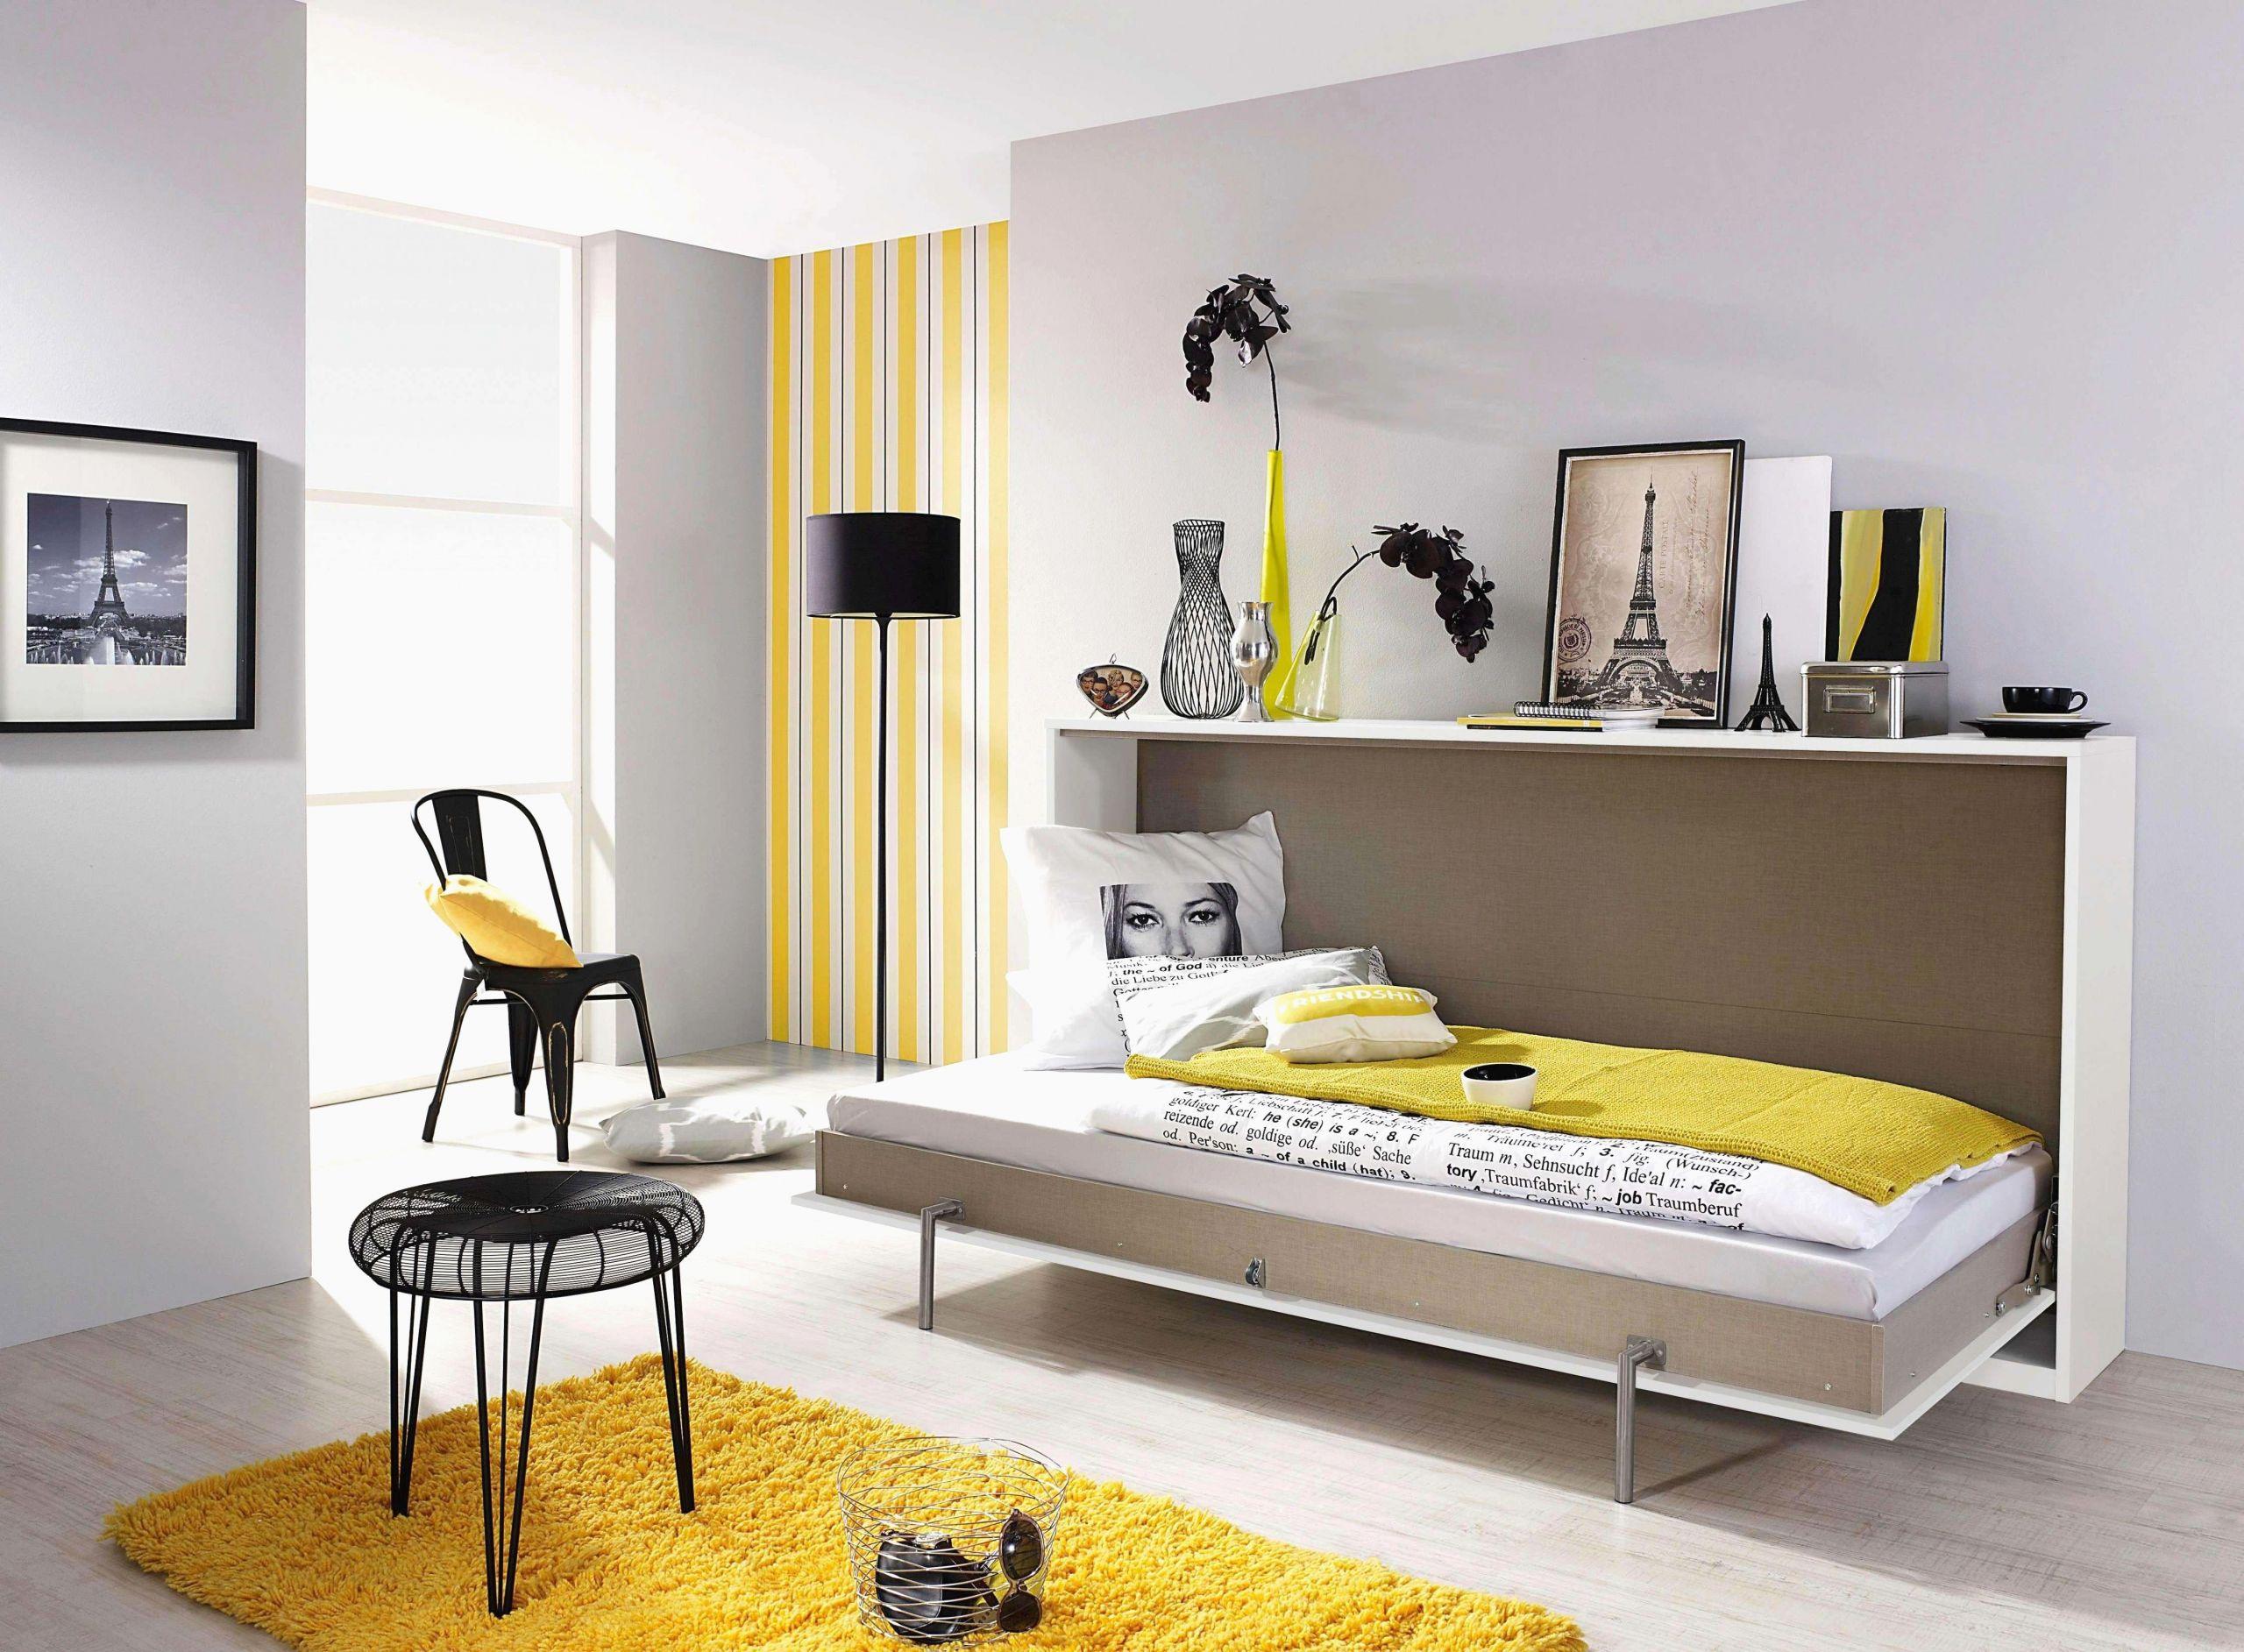 32 schon sofa sitzhohe senioren jw7gdg konzept of wohnzimmer mobel massivholz